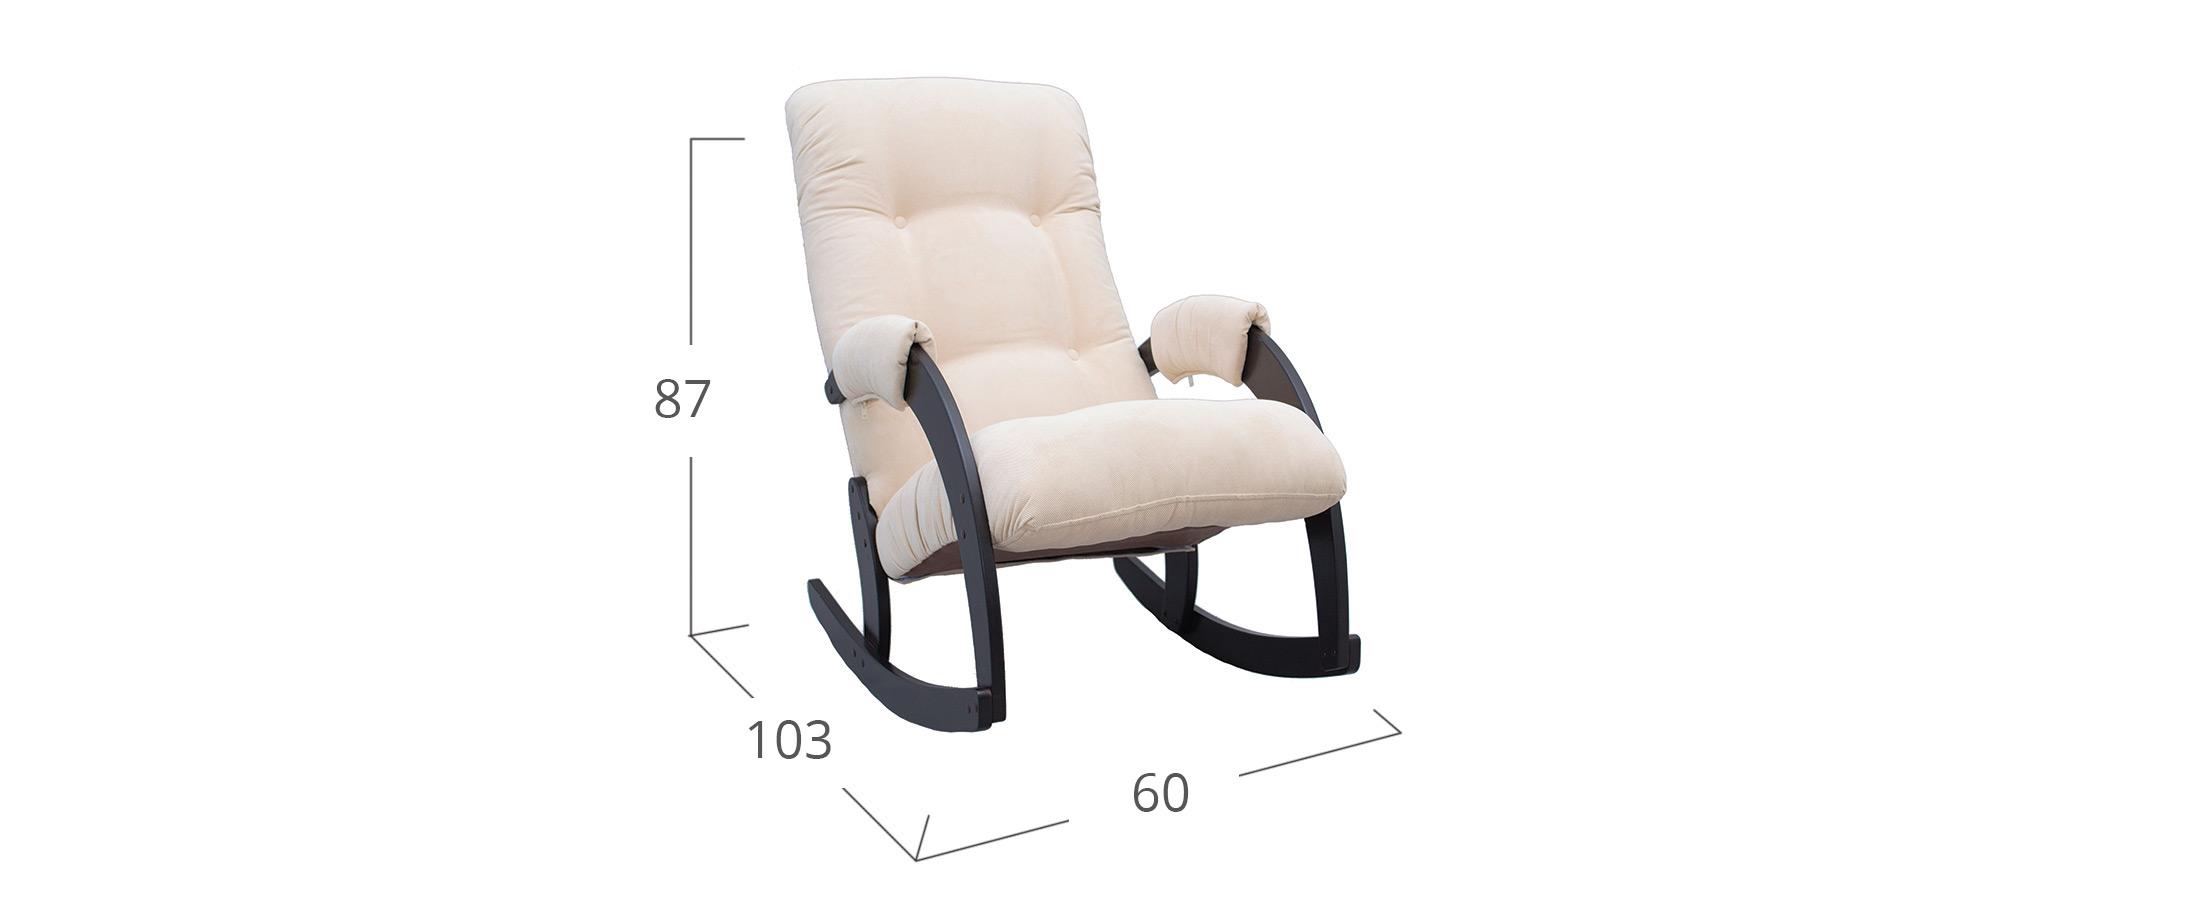 Кресло-качалка 67 Verona Vanilla, венге  Модель 364